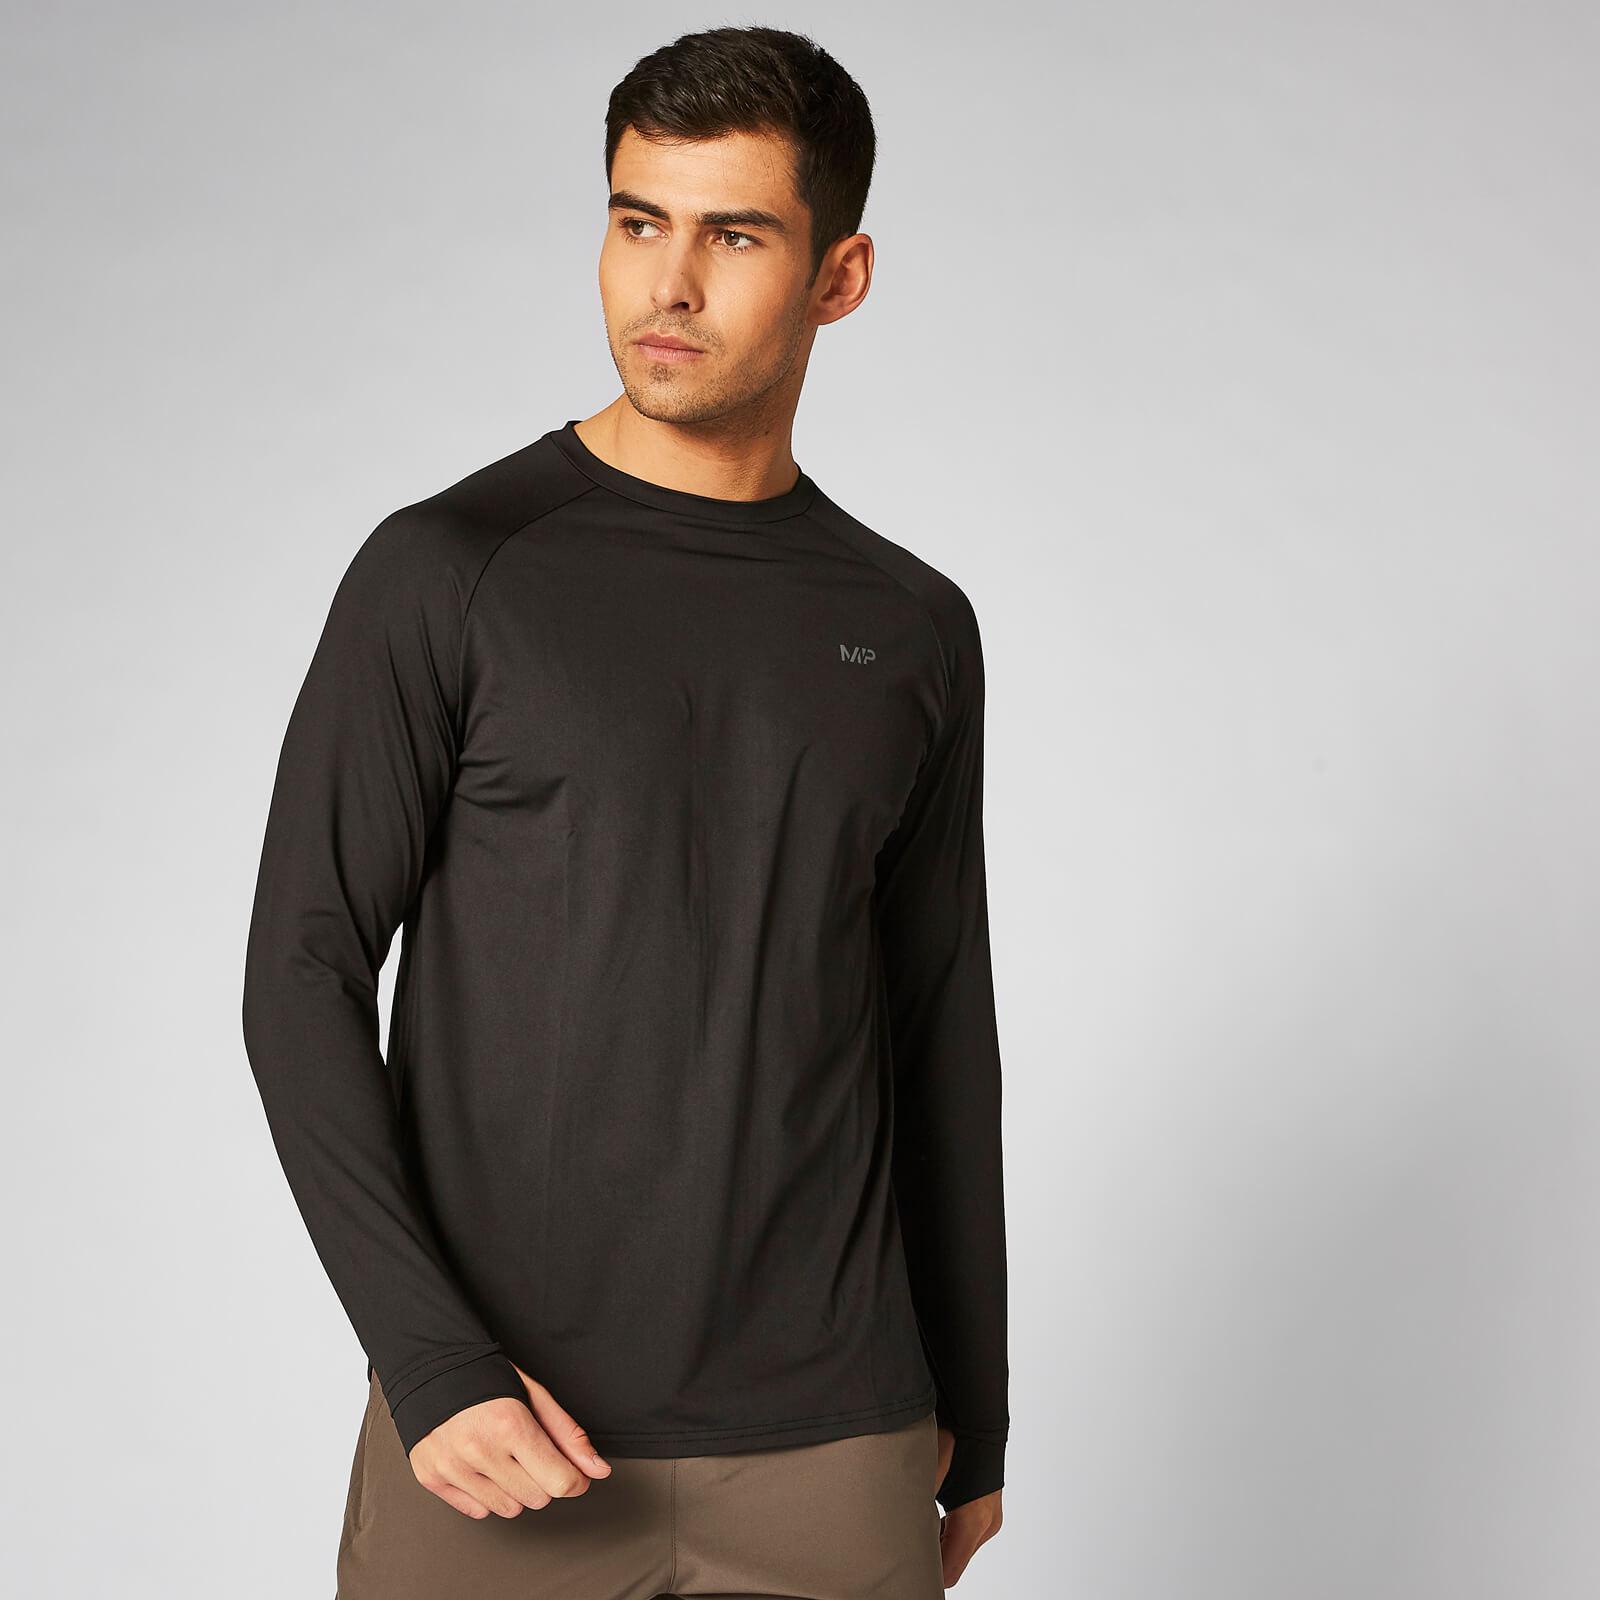 Myprotein Dry-Tech Infinity Long-Sleeve T-Shirt – Black - S